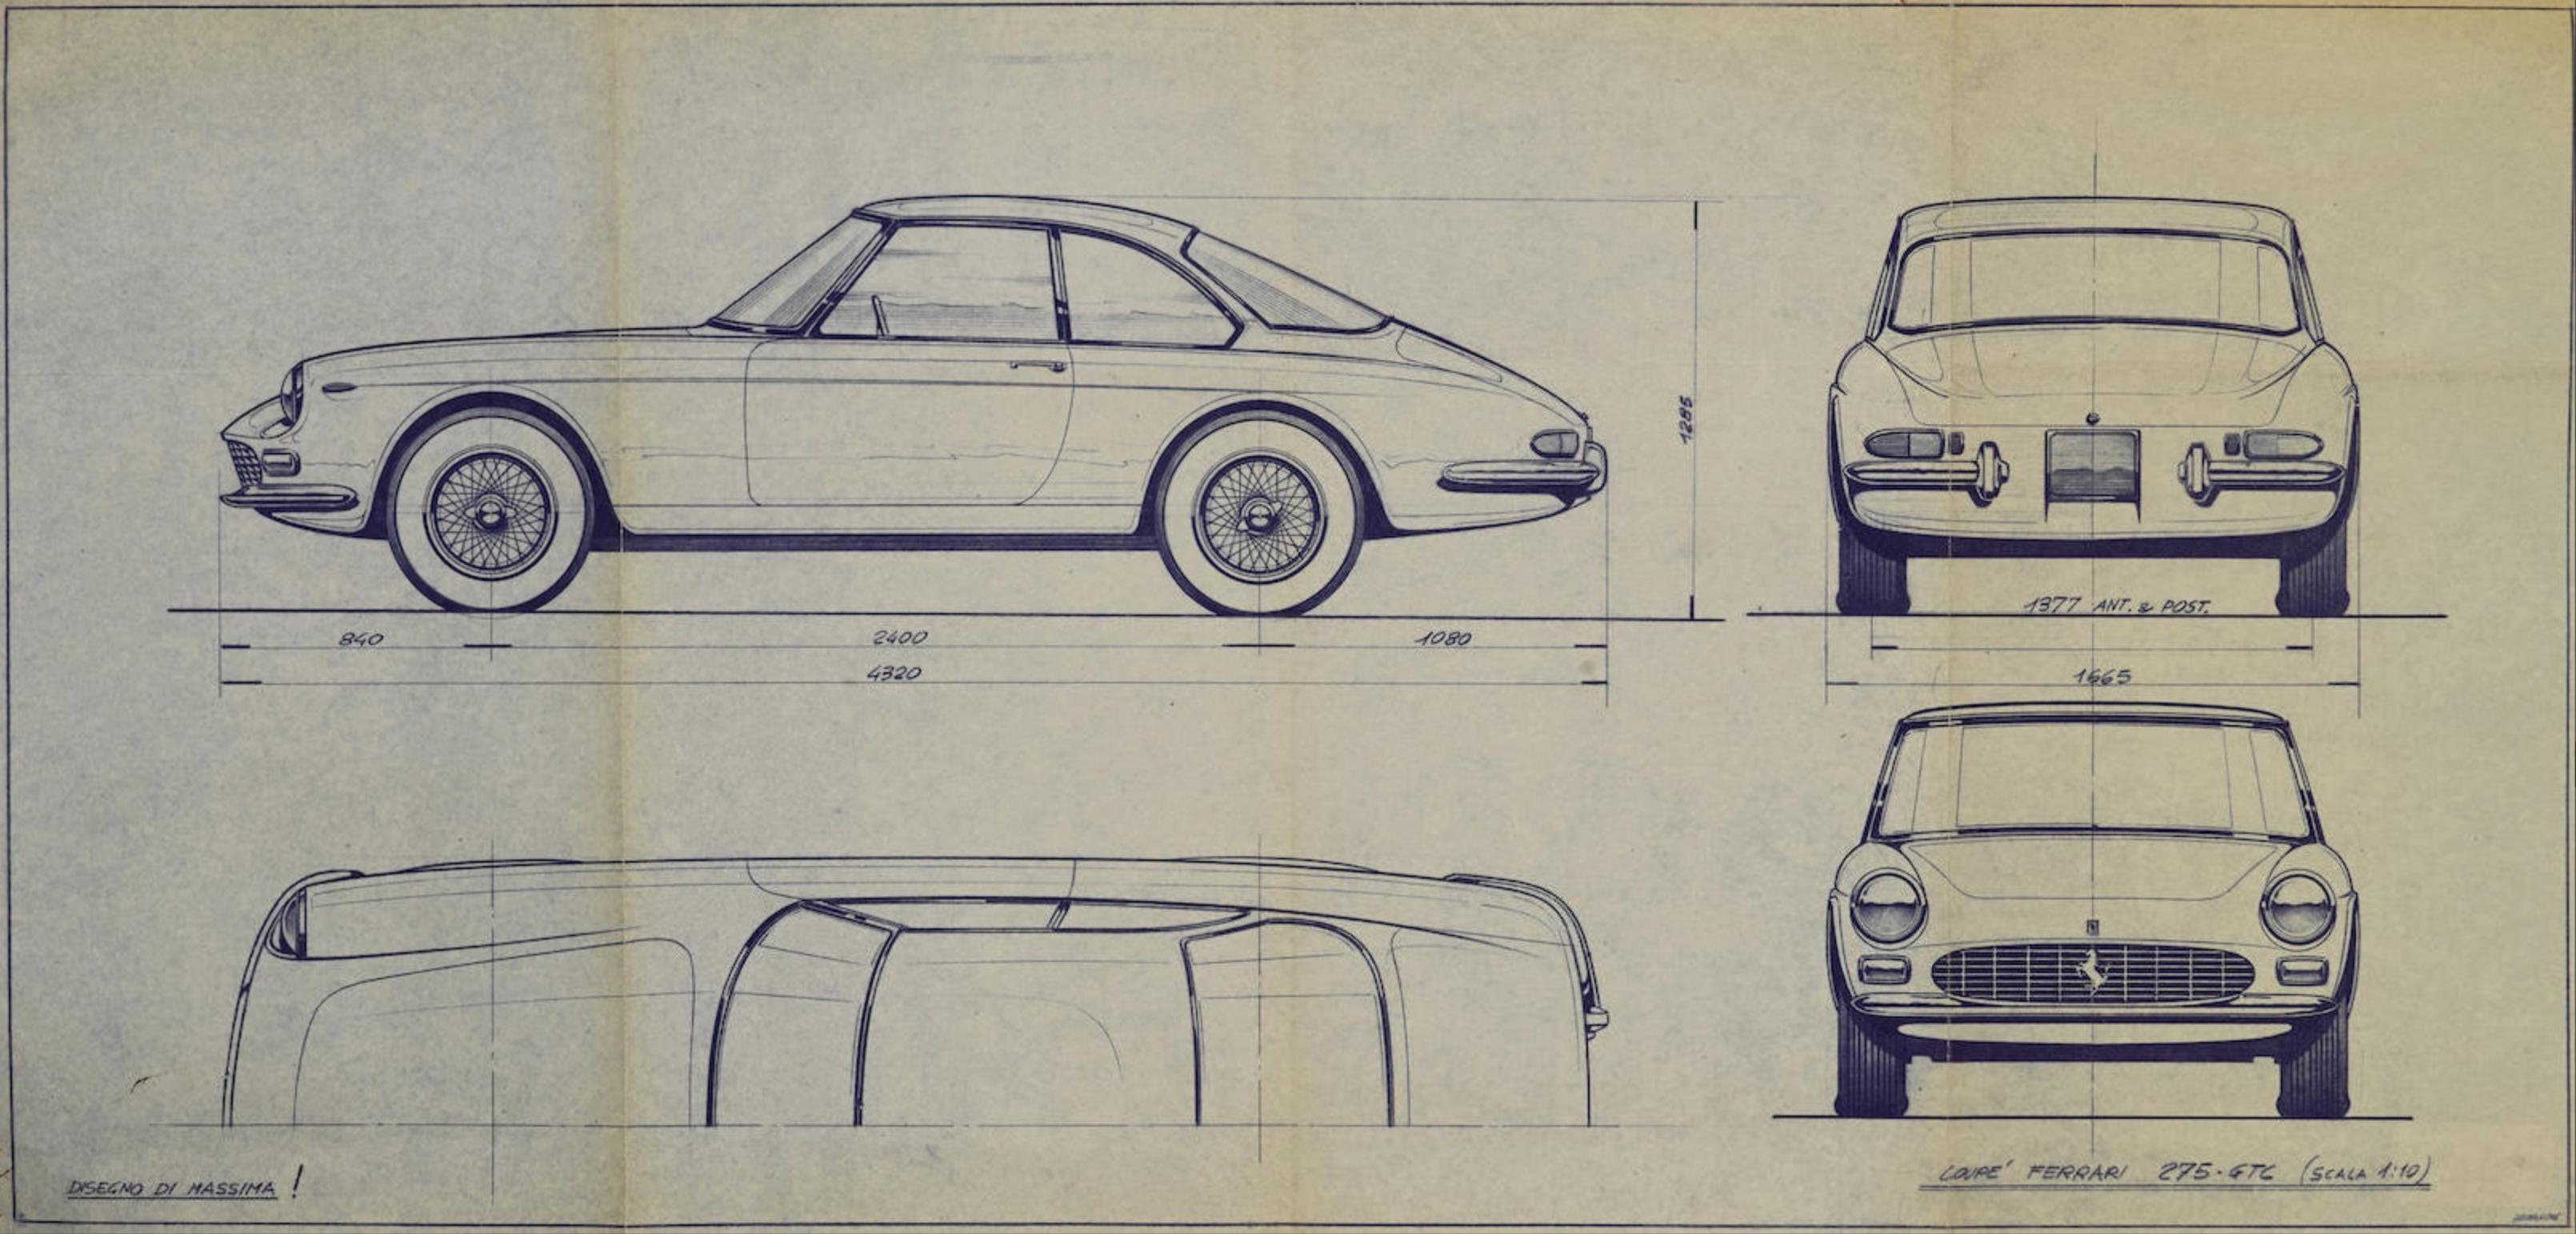 Ferrari 275 GTC blueprint